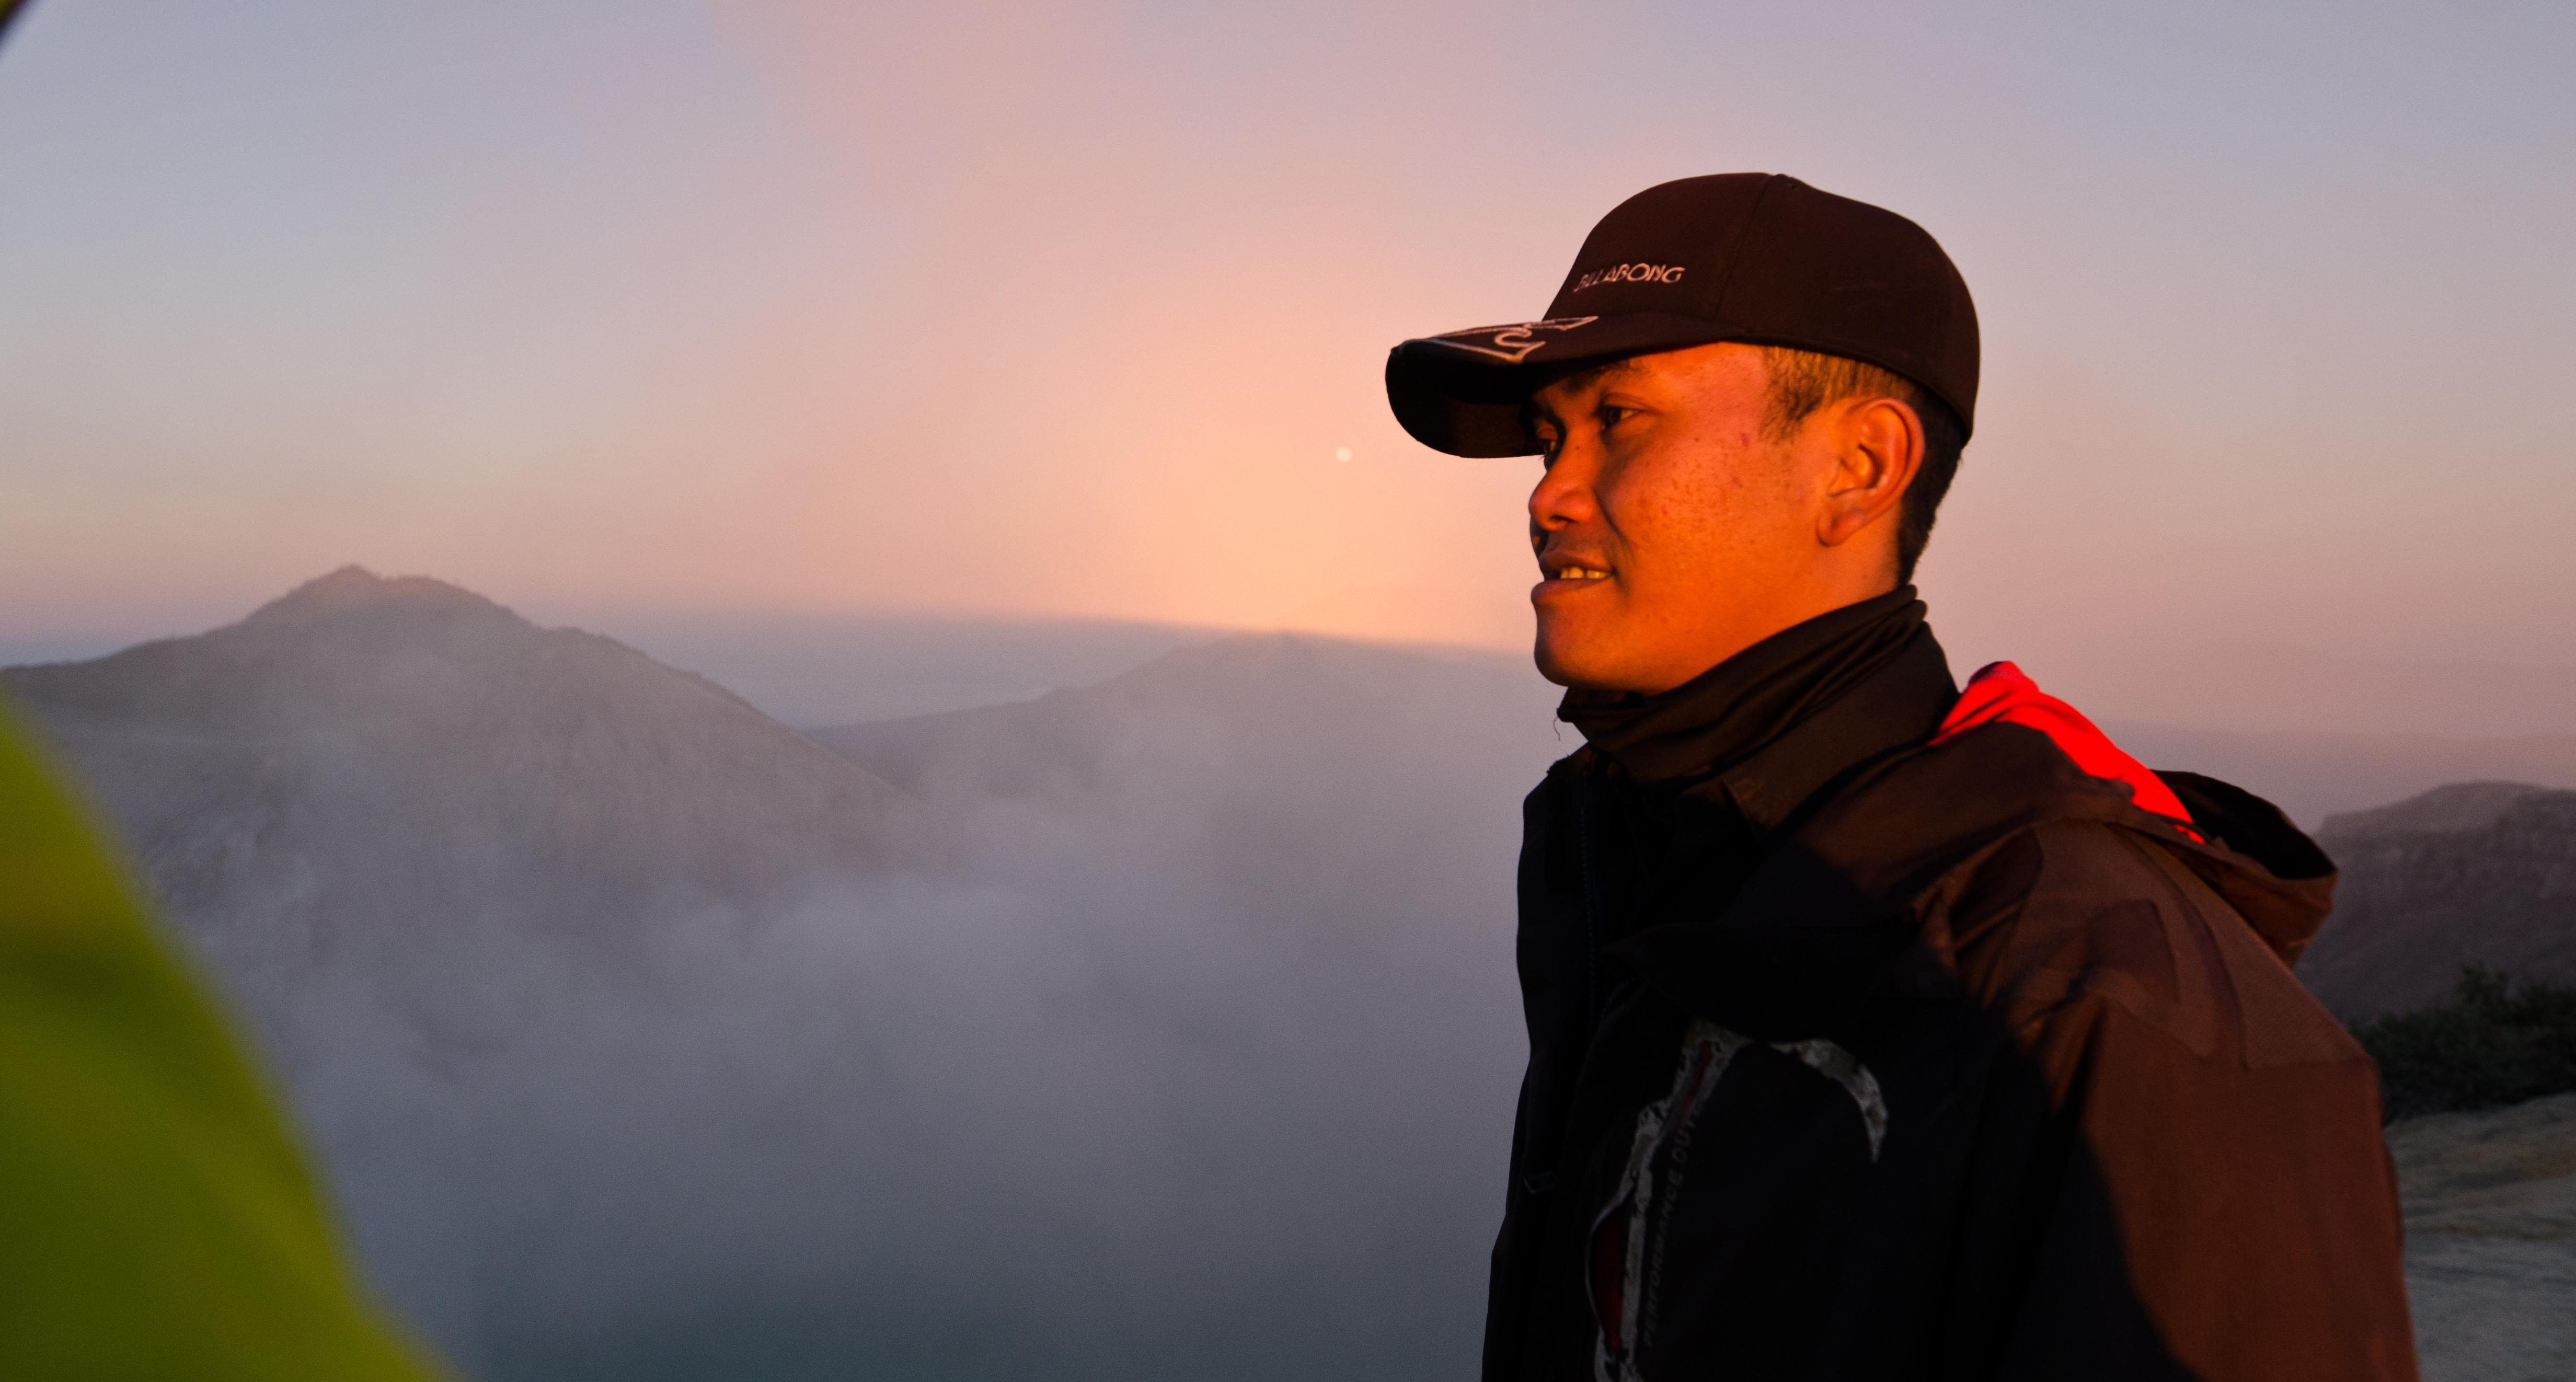 Mount Ijen > Banyuwangi > TheRoamingNoodle